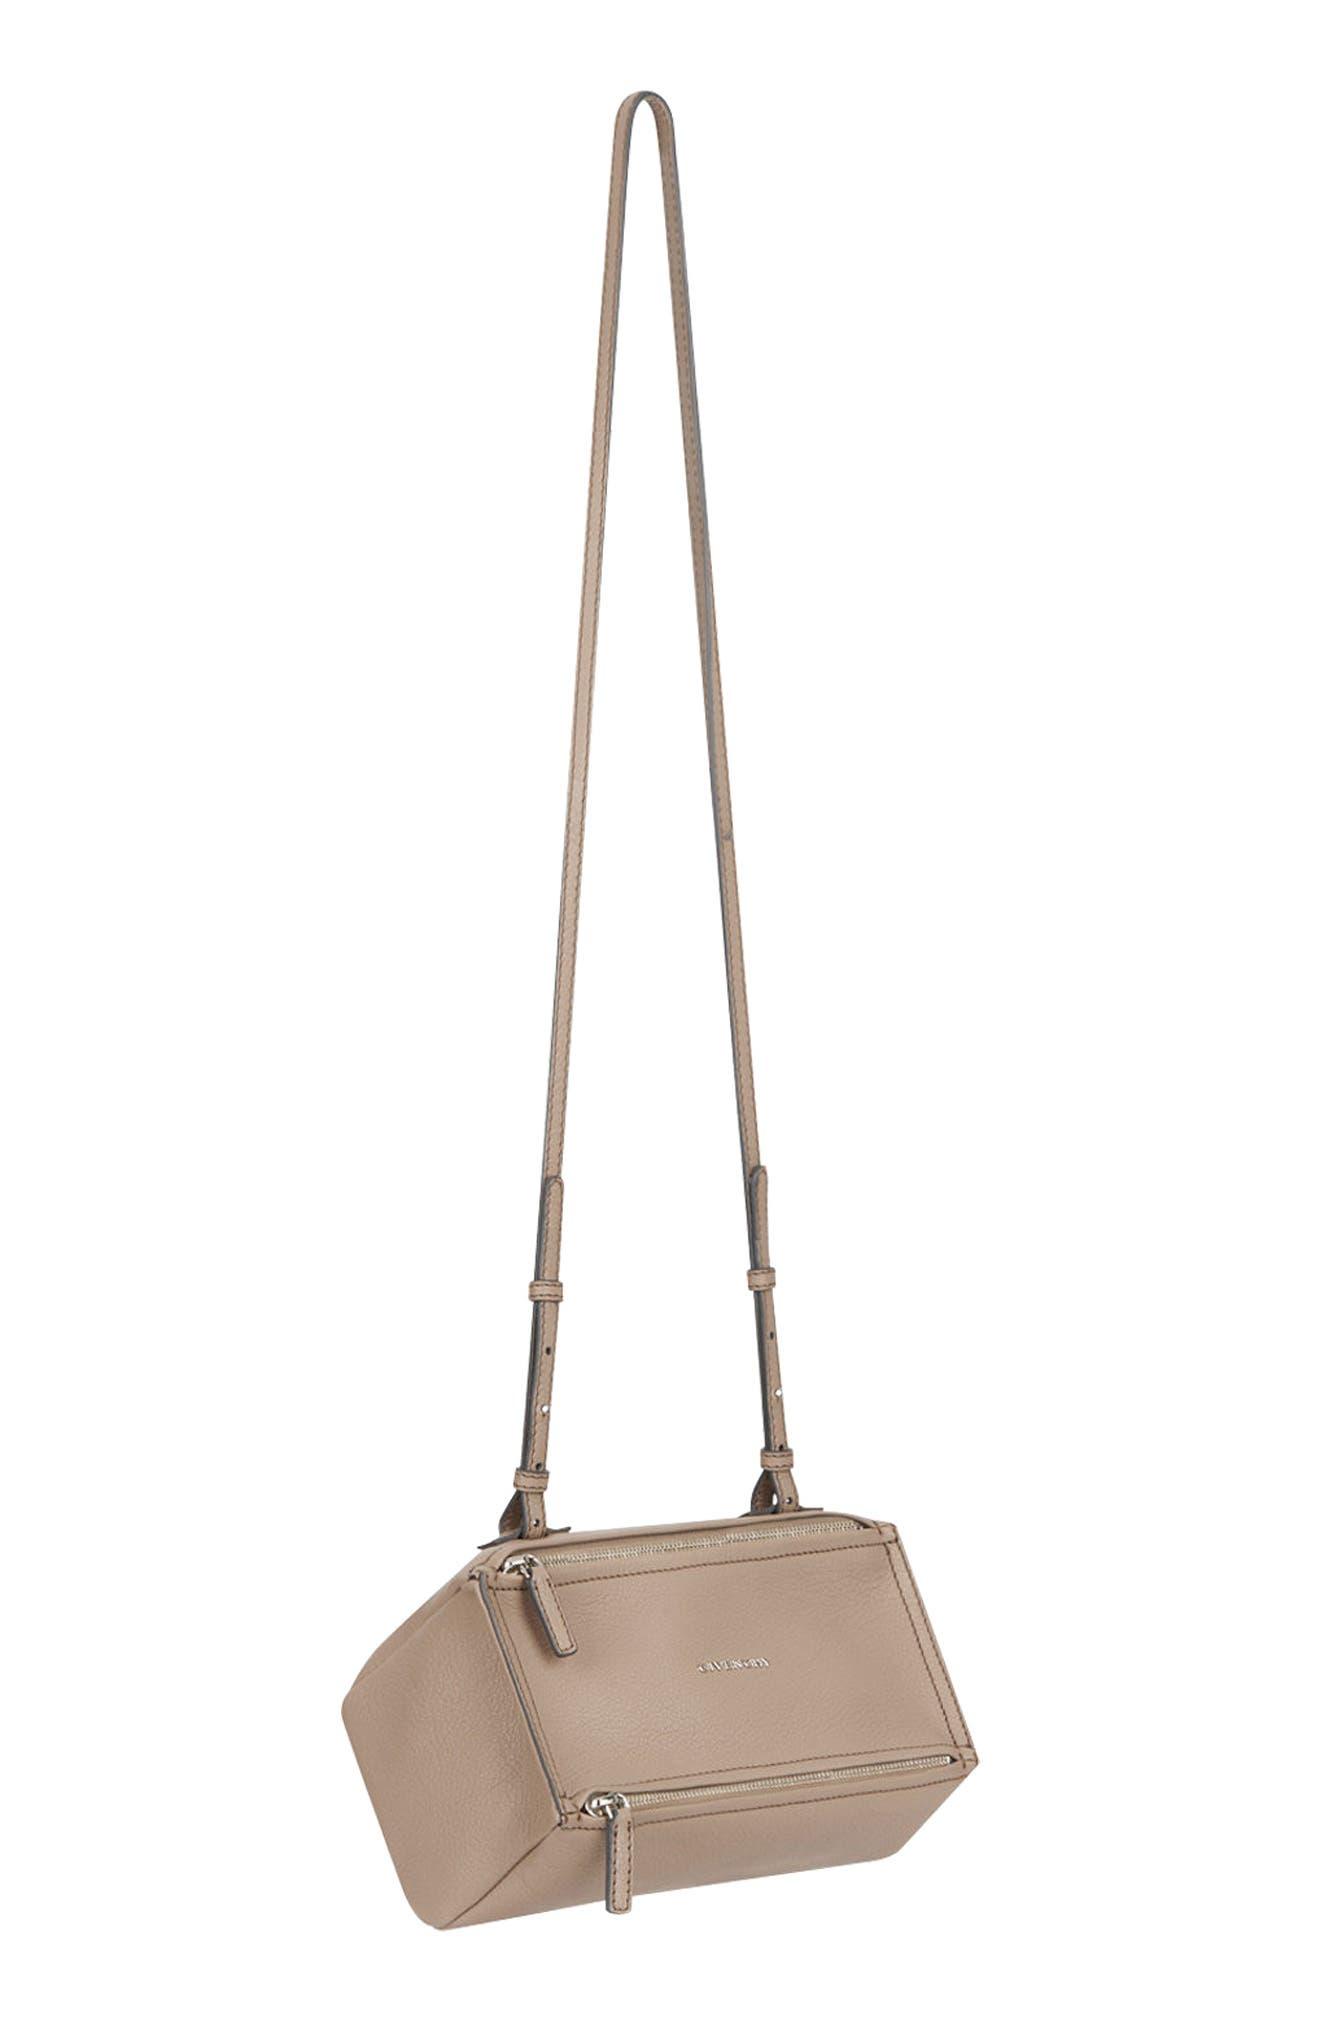 'Mini Pandora' Sugar Leather Shoulder Bag,                             Alternate thumbnail 5, color,                             POWDER